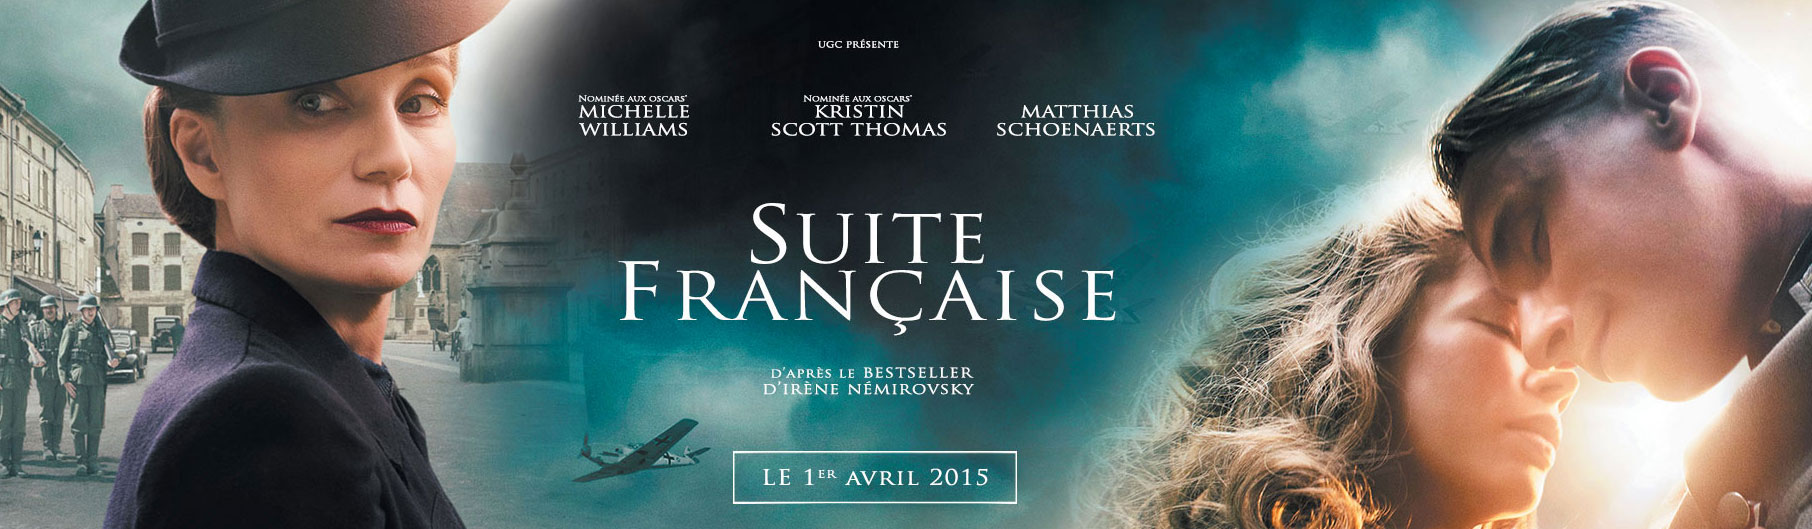 SUITE FRANCAISE - Bandeau Visuel Large Facebook UGC Distribution 2 - Go with the Blog